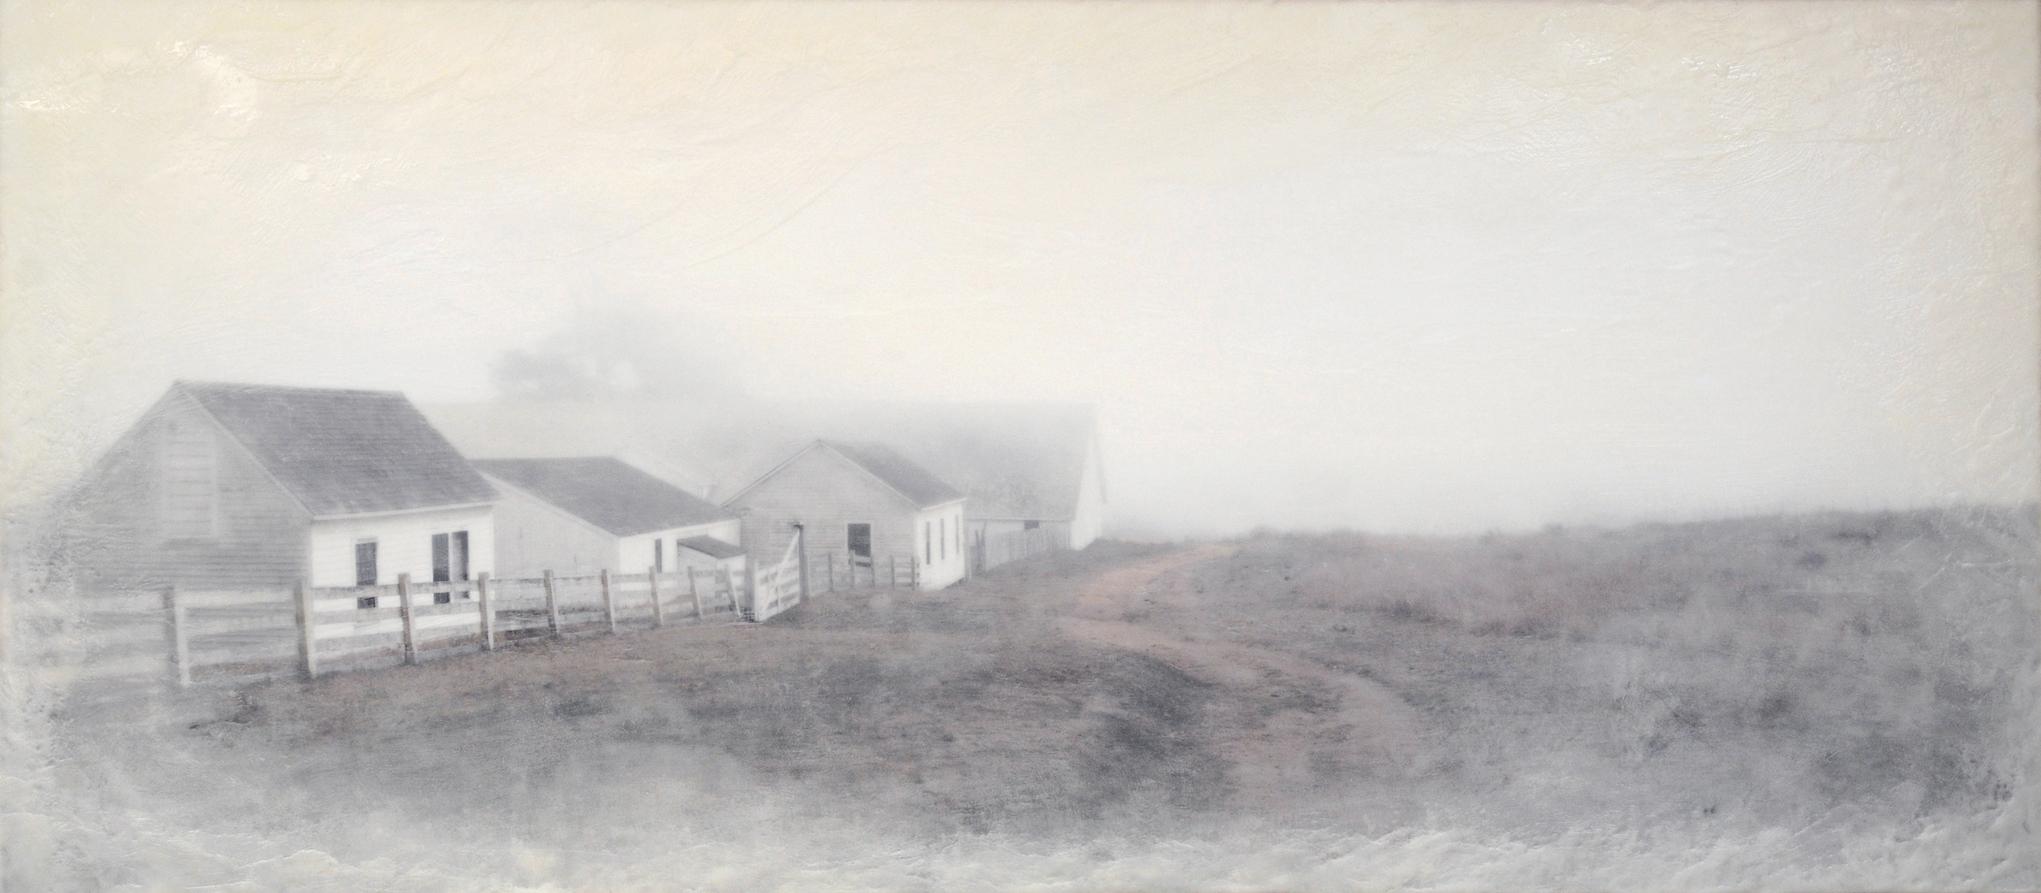 Pierce Point Ranch Pano   (NA)